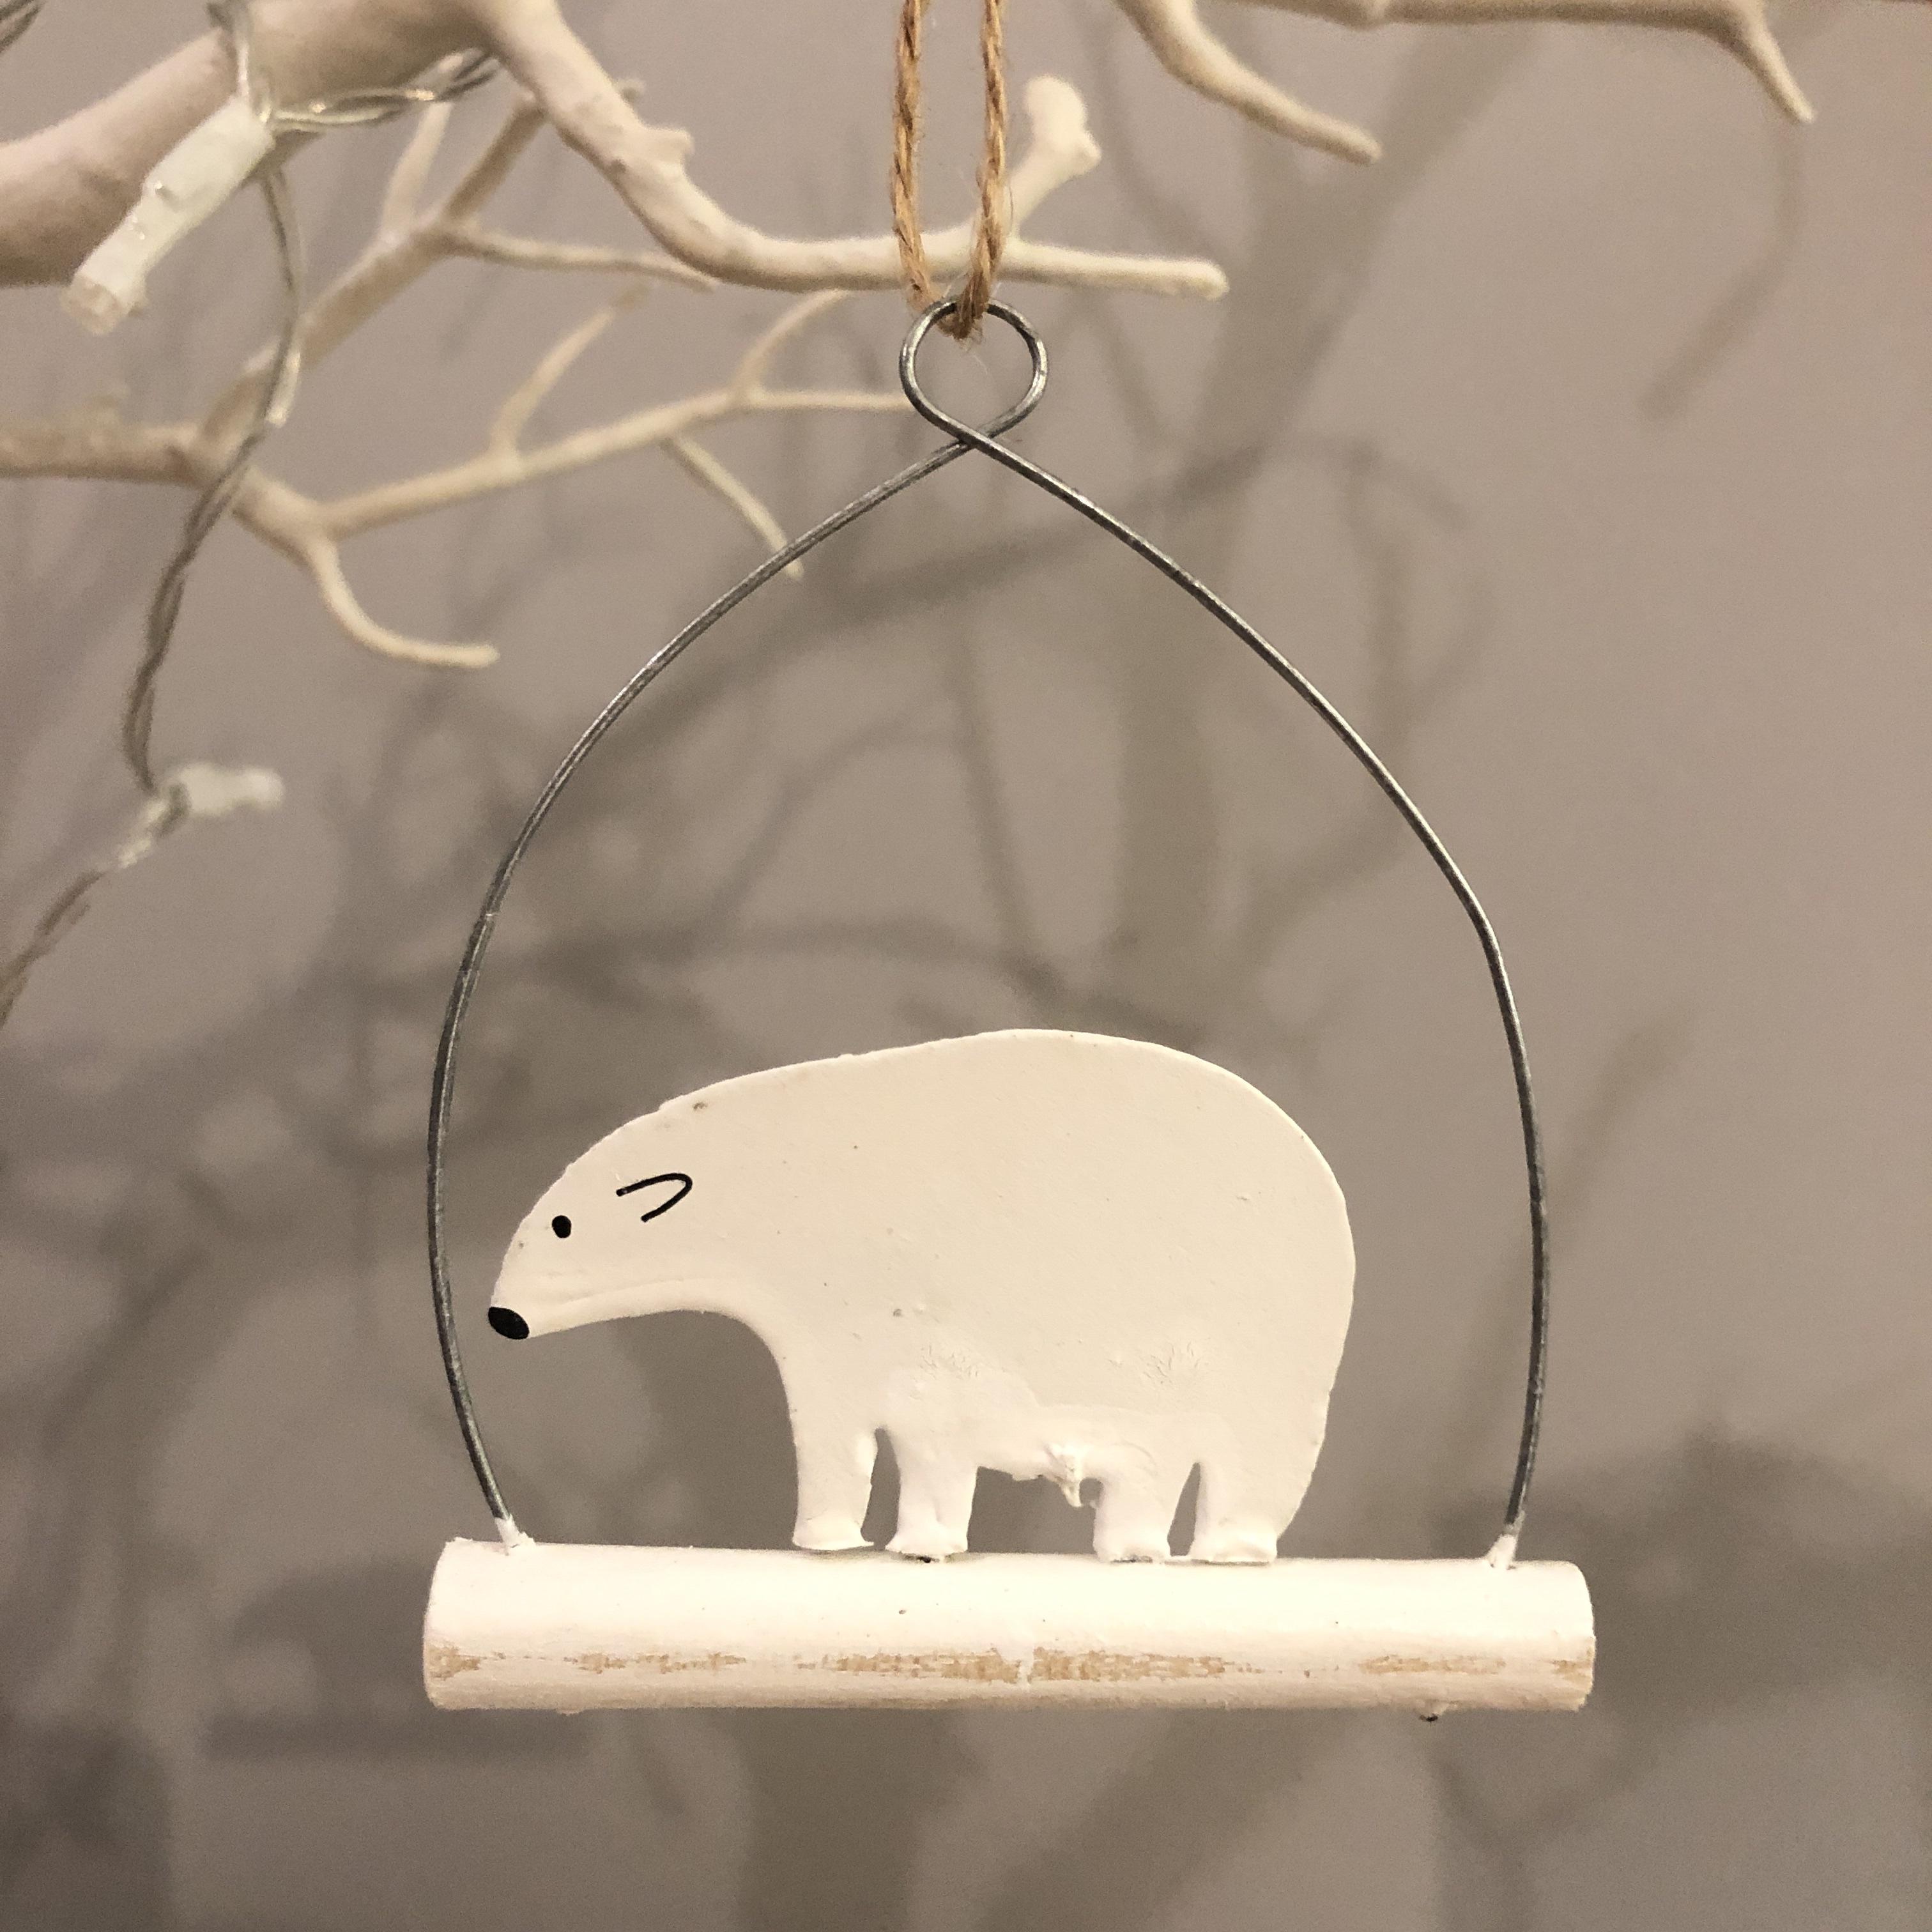 Polar bear on twig hanging Christmas decoration by shoeless joe